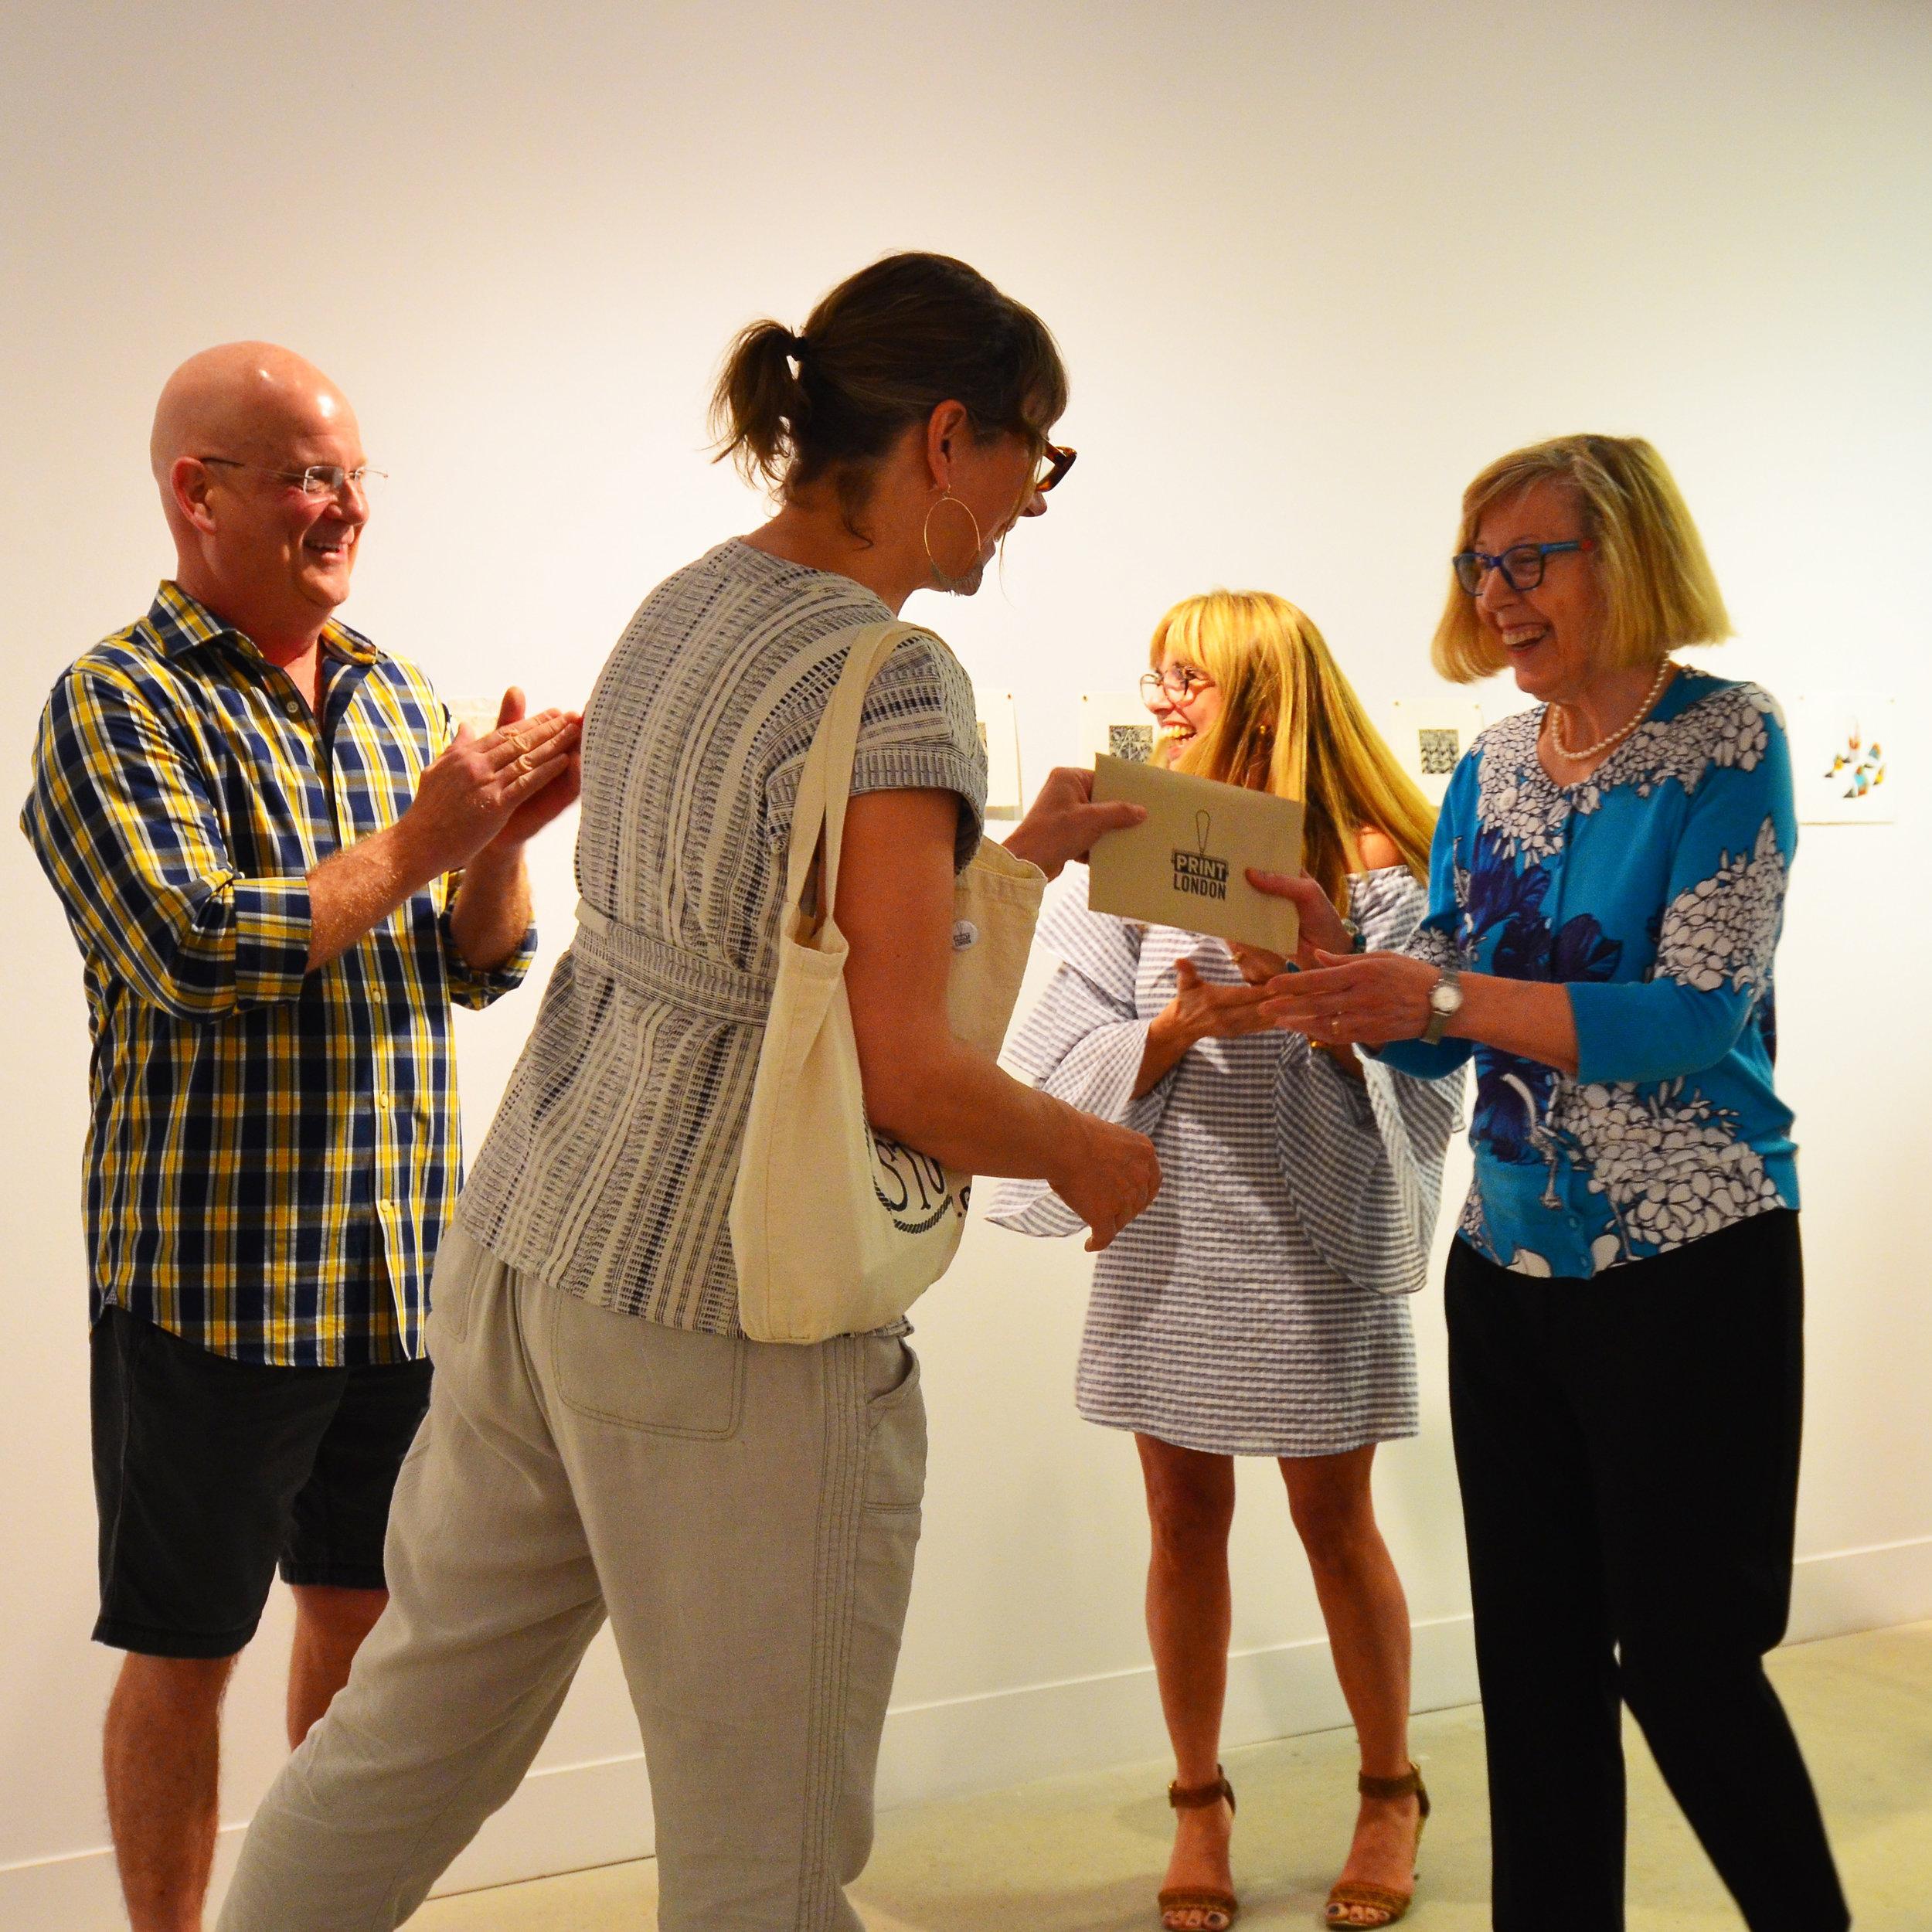 Second Prize Winner: Ann Unger (Right)